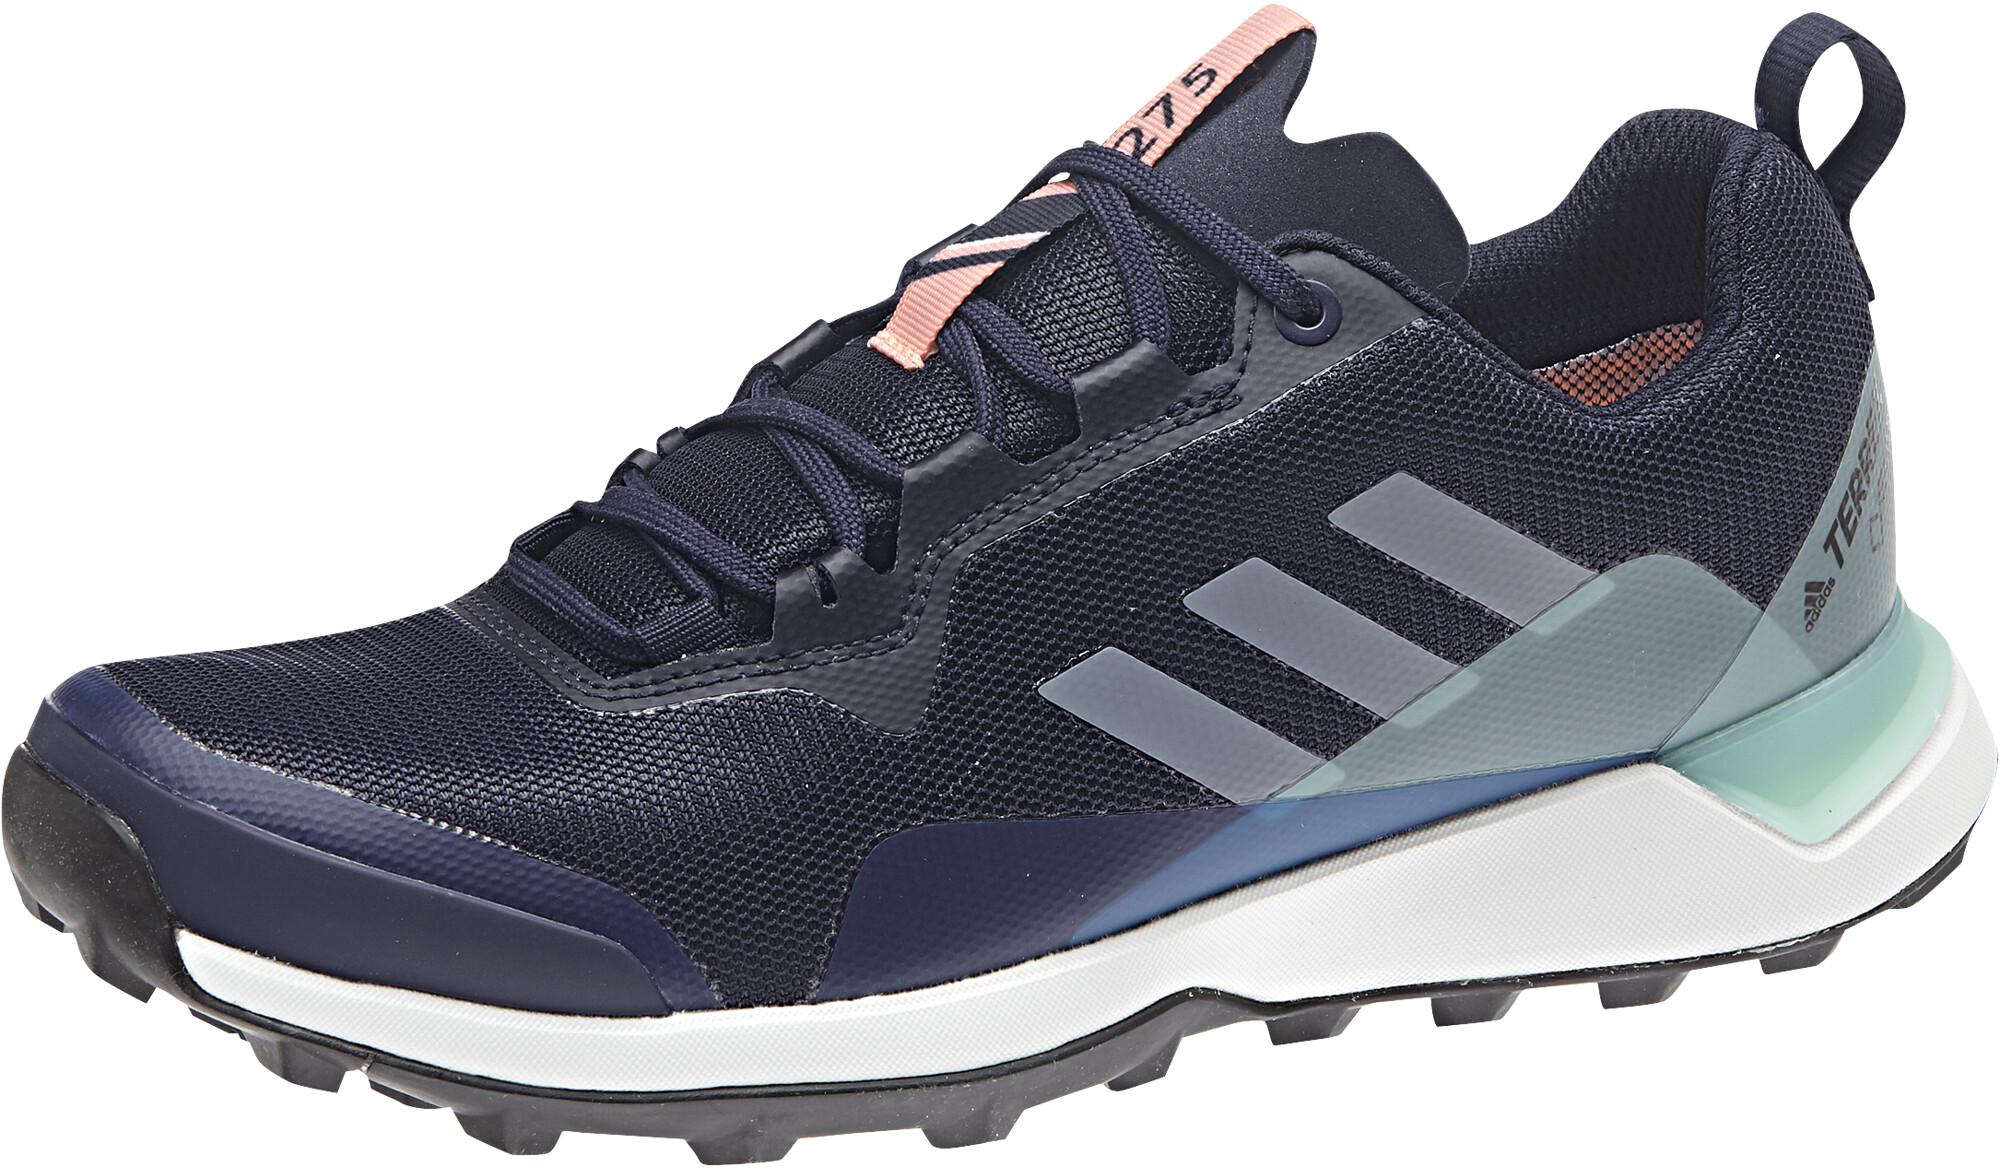 separation shoes f8545 b7cef adidas TERREX CMTK GTX Hardloopschoenen Dames blauw